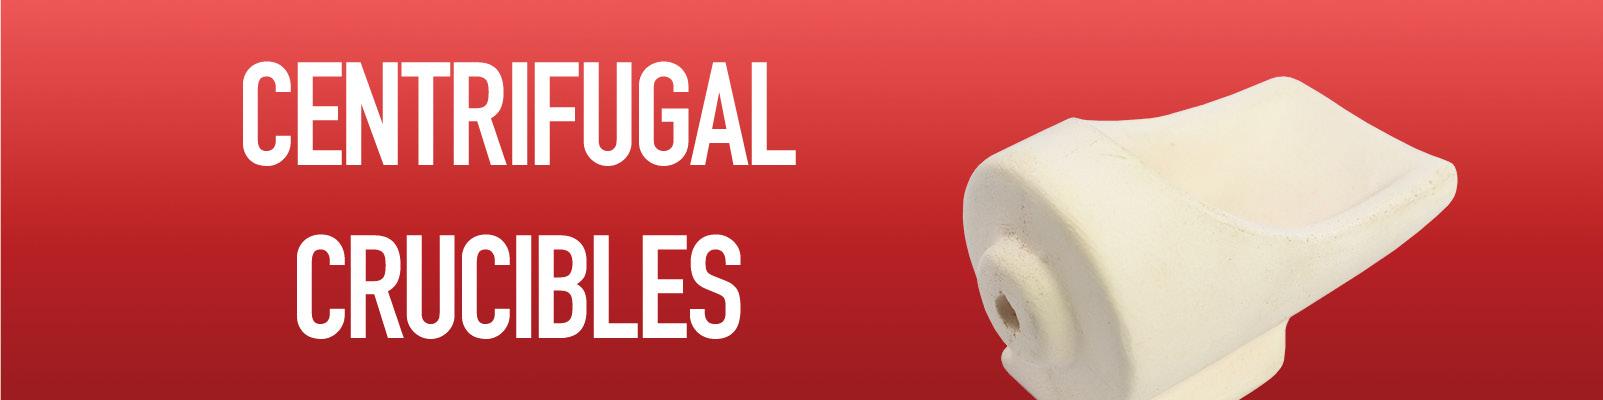 Centrifugal Crucibles